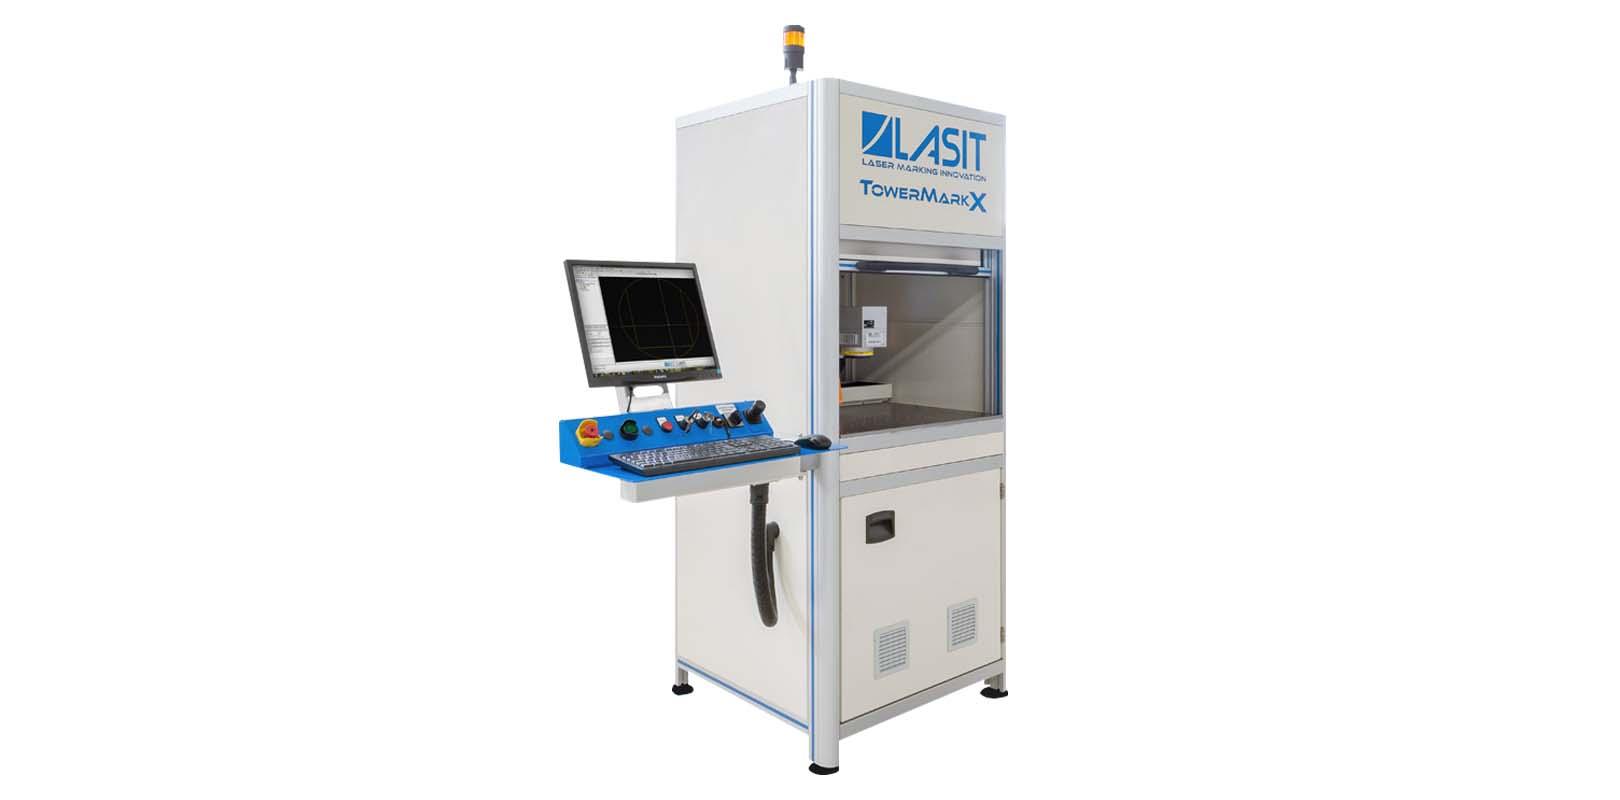 Lasit Towermark X Sheetmetal Machinery Australia